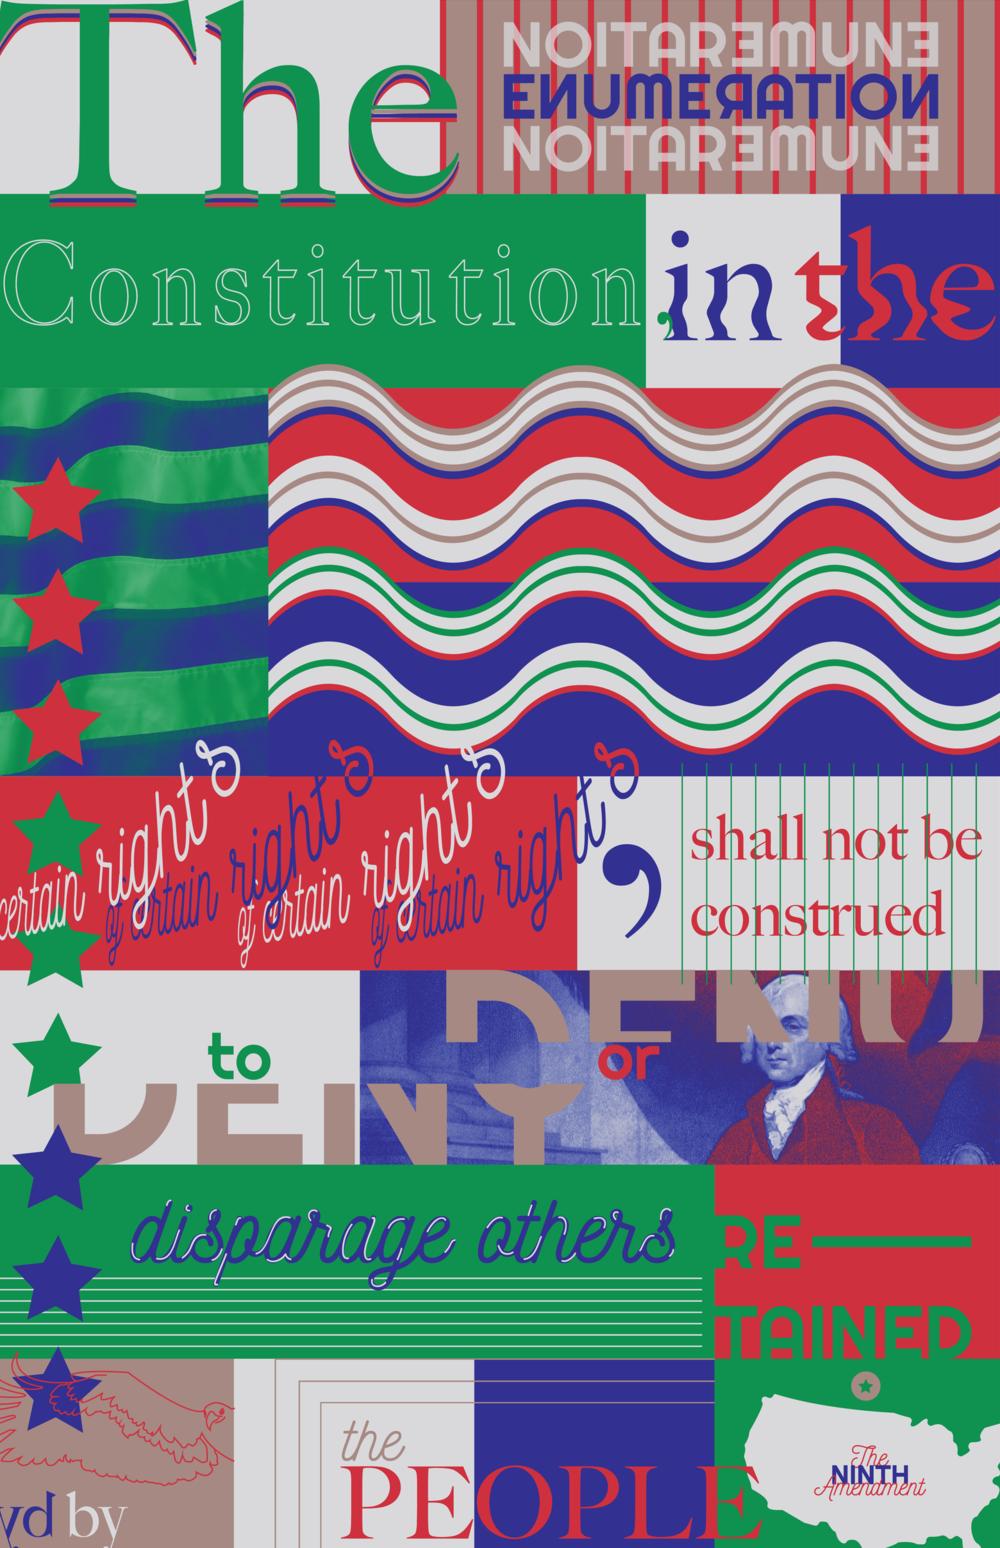 Ninth amendment poster